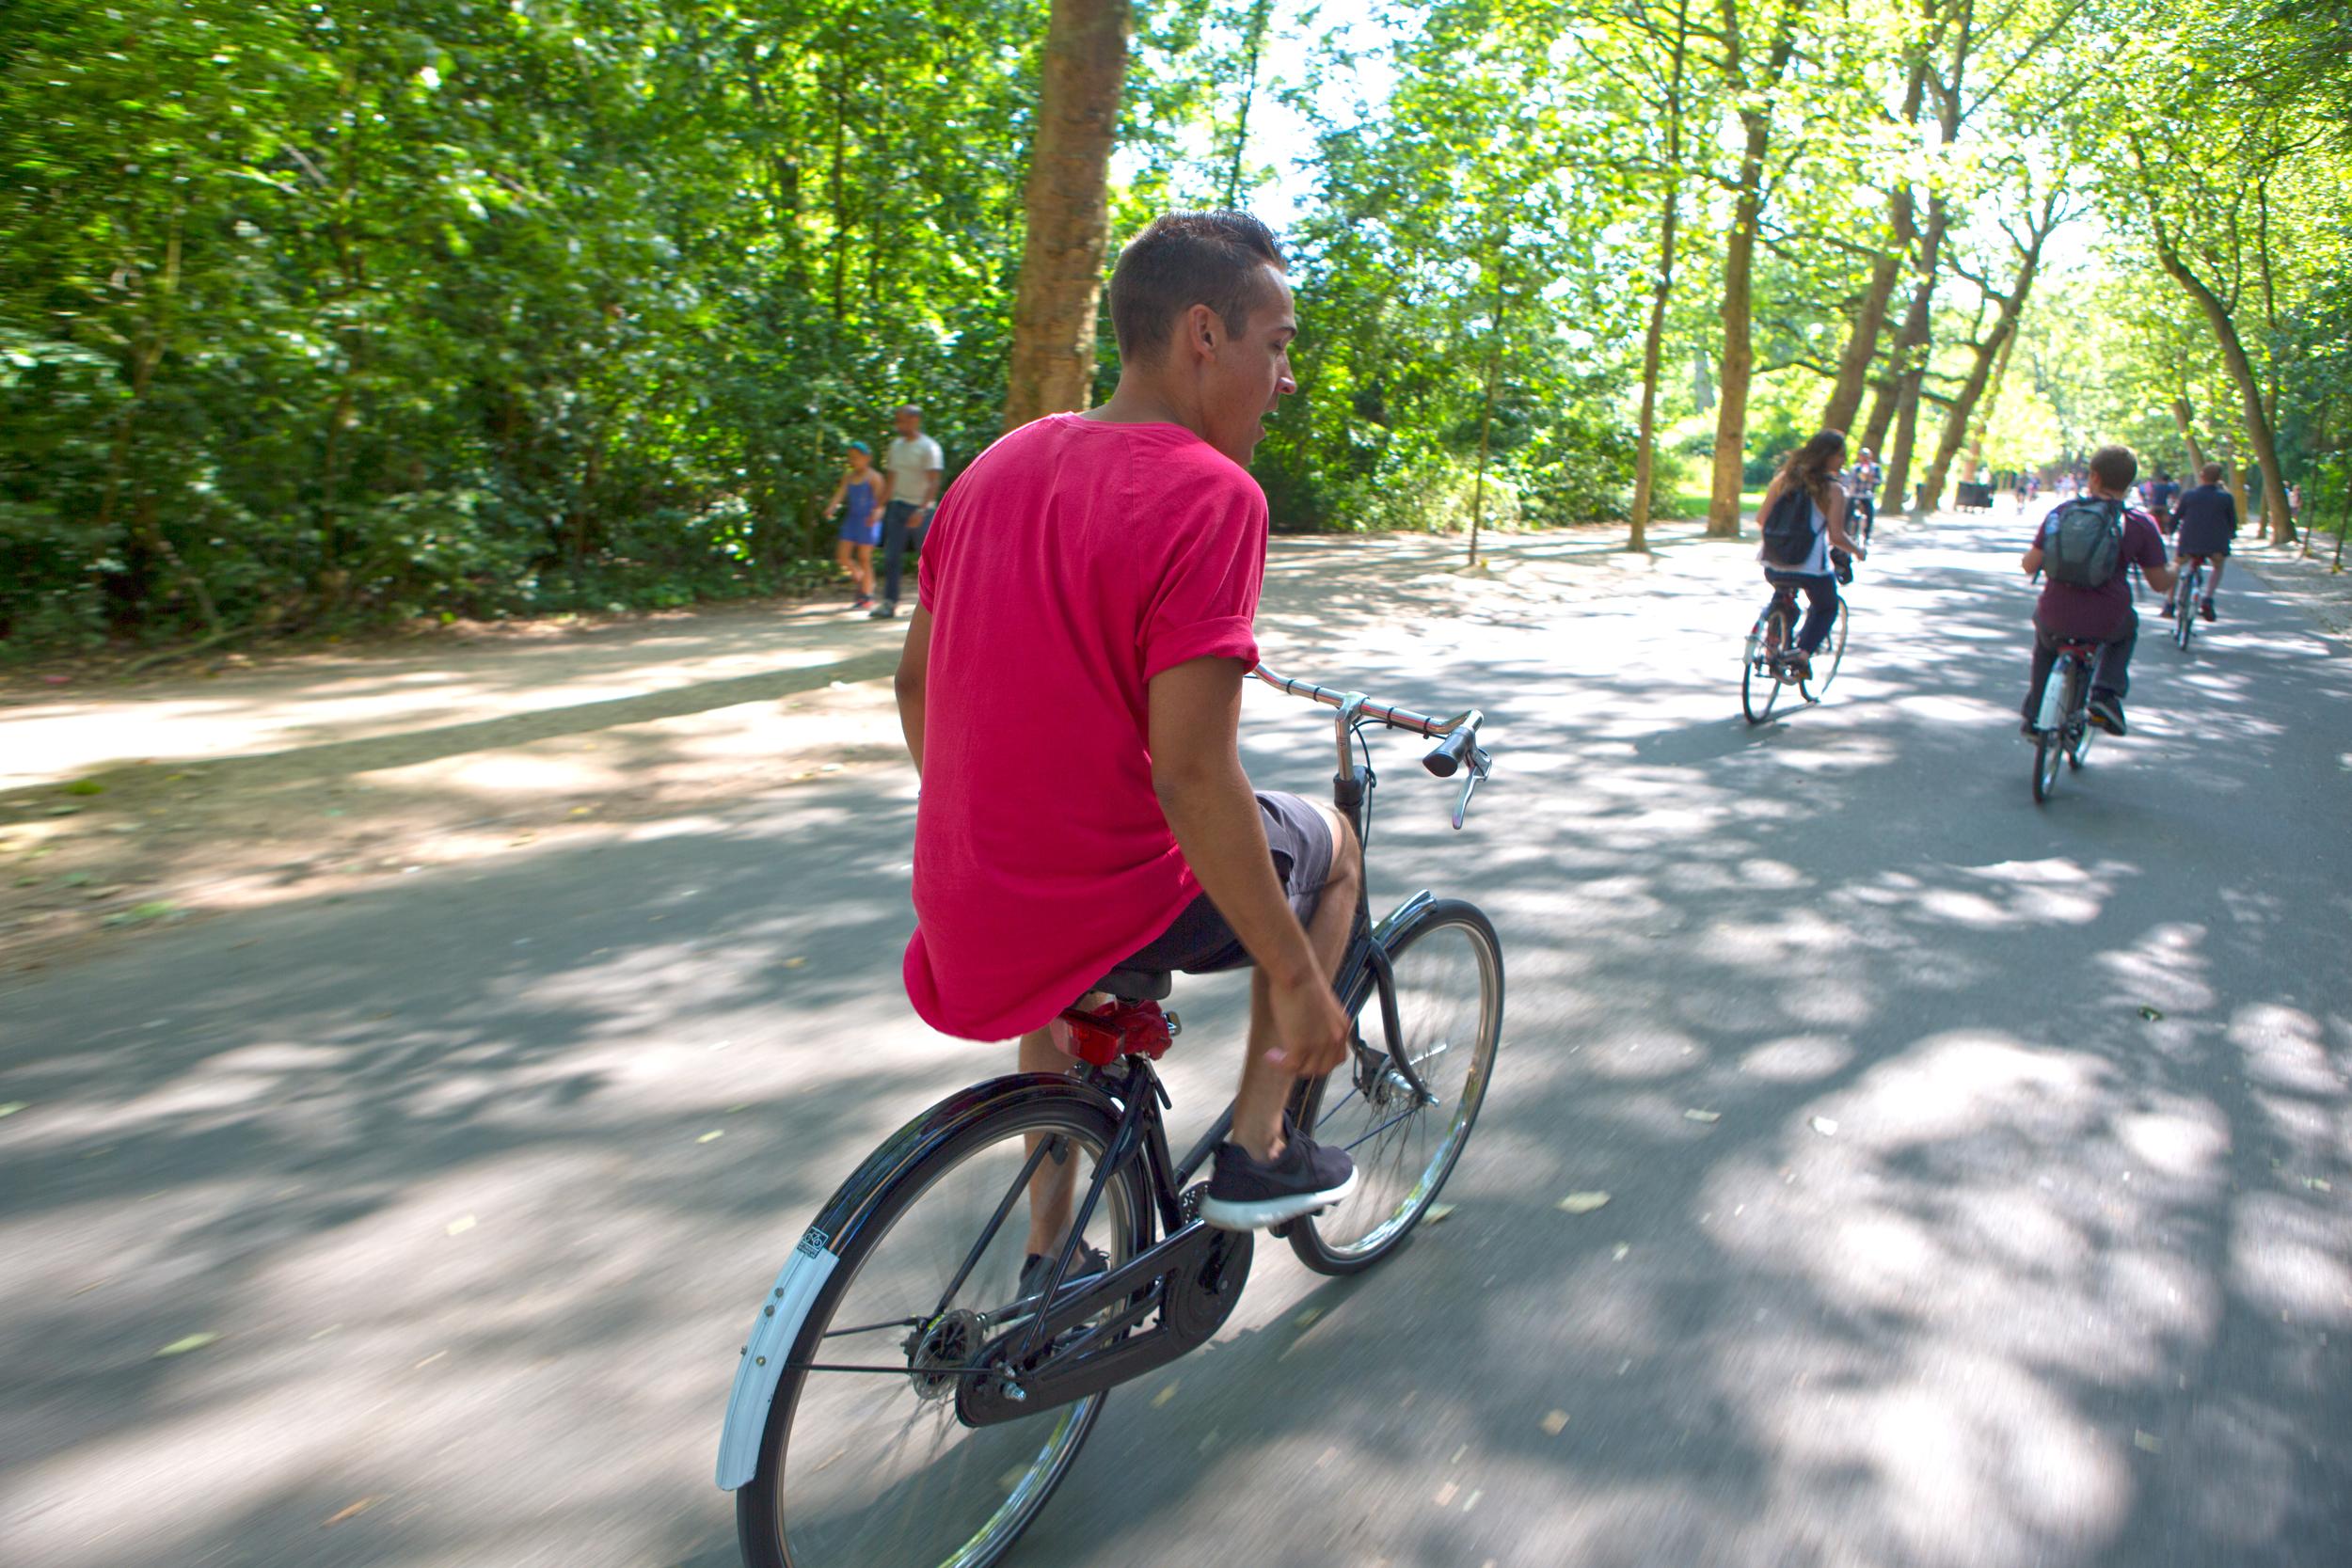 Biking in the park.jpg